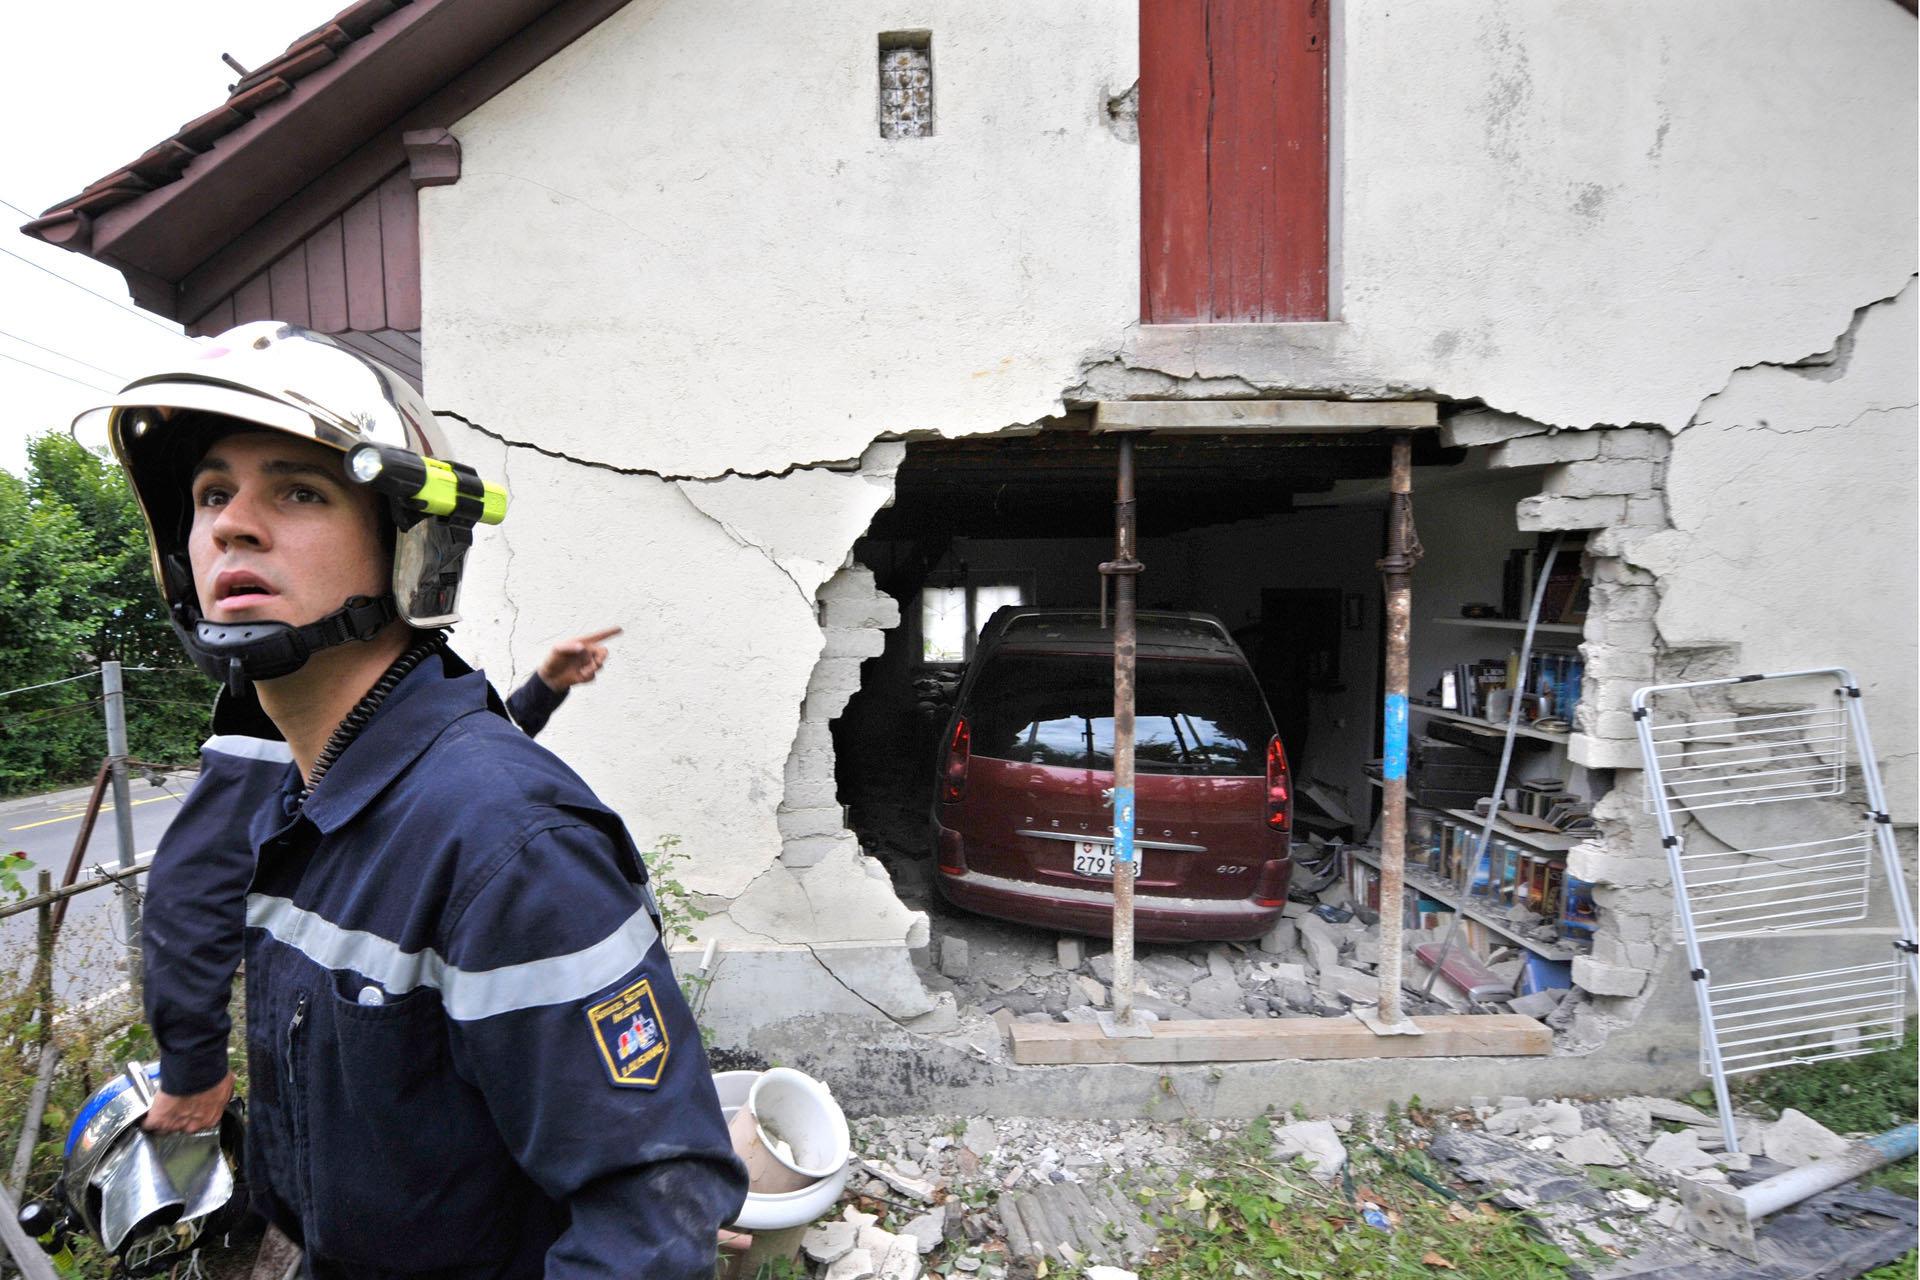 Accident voiture - Lausanne - 2006